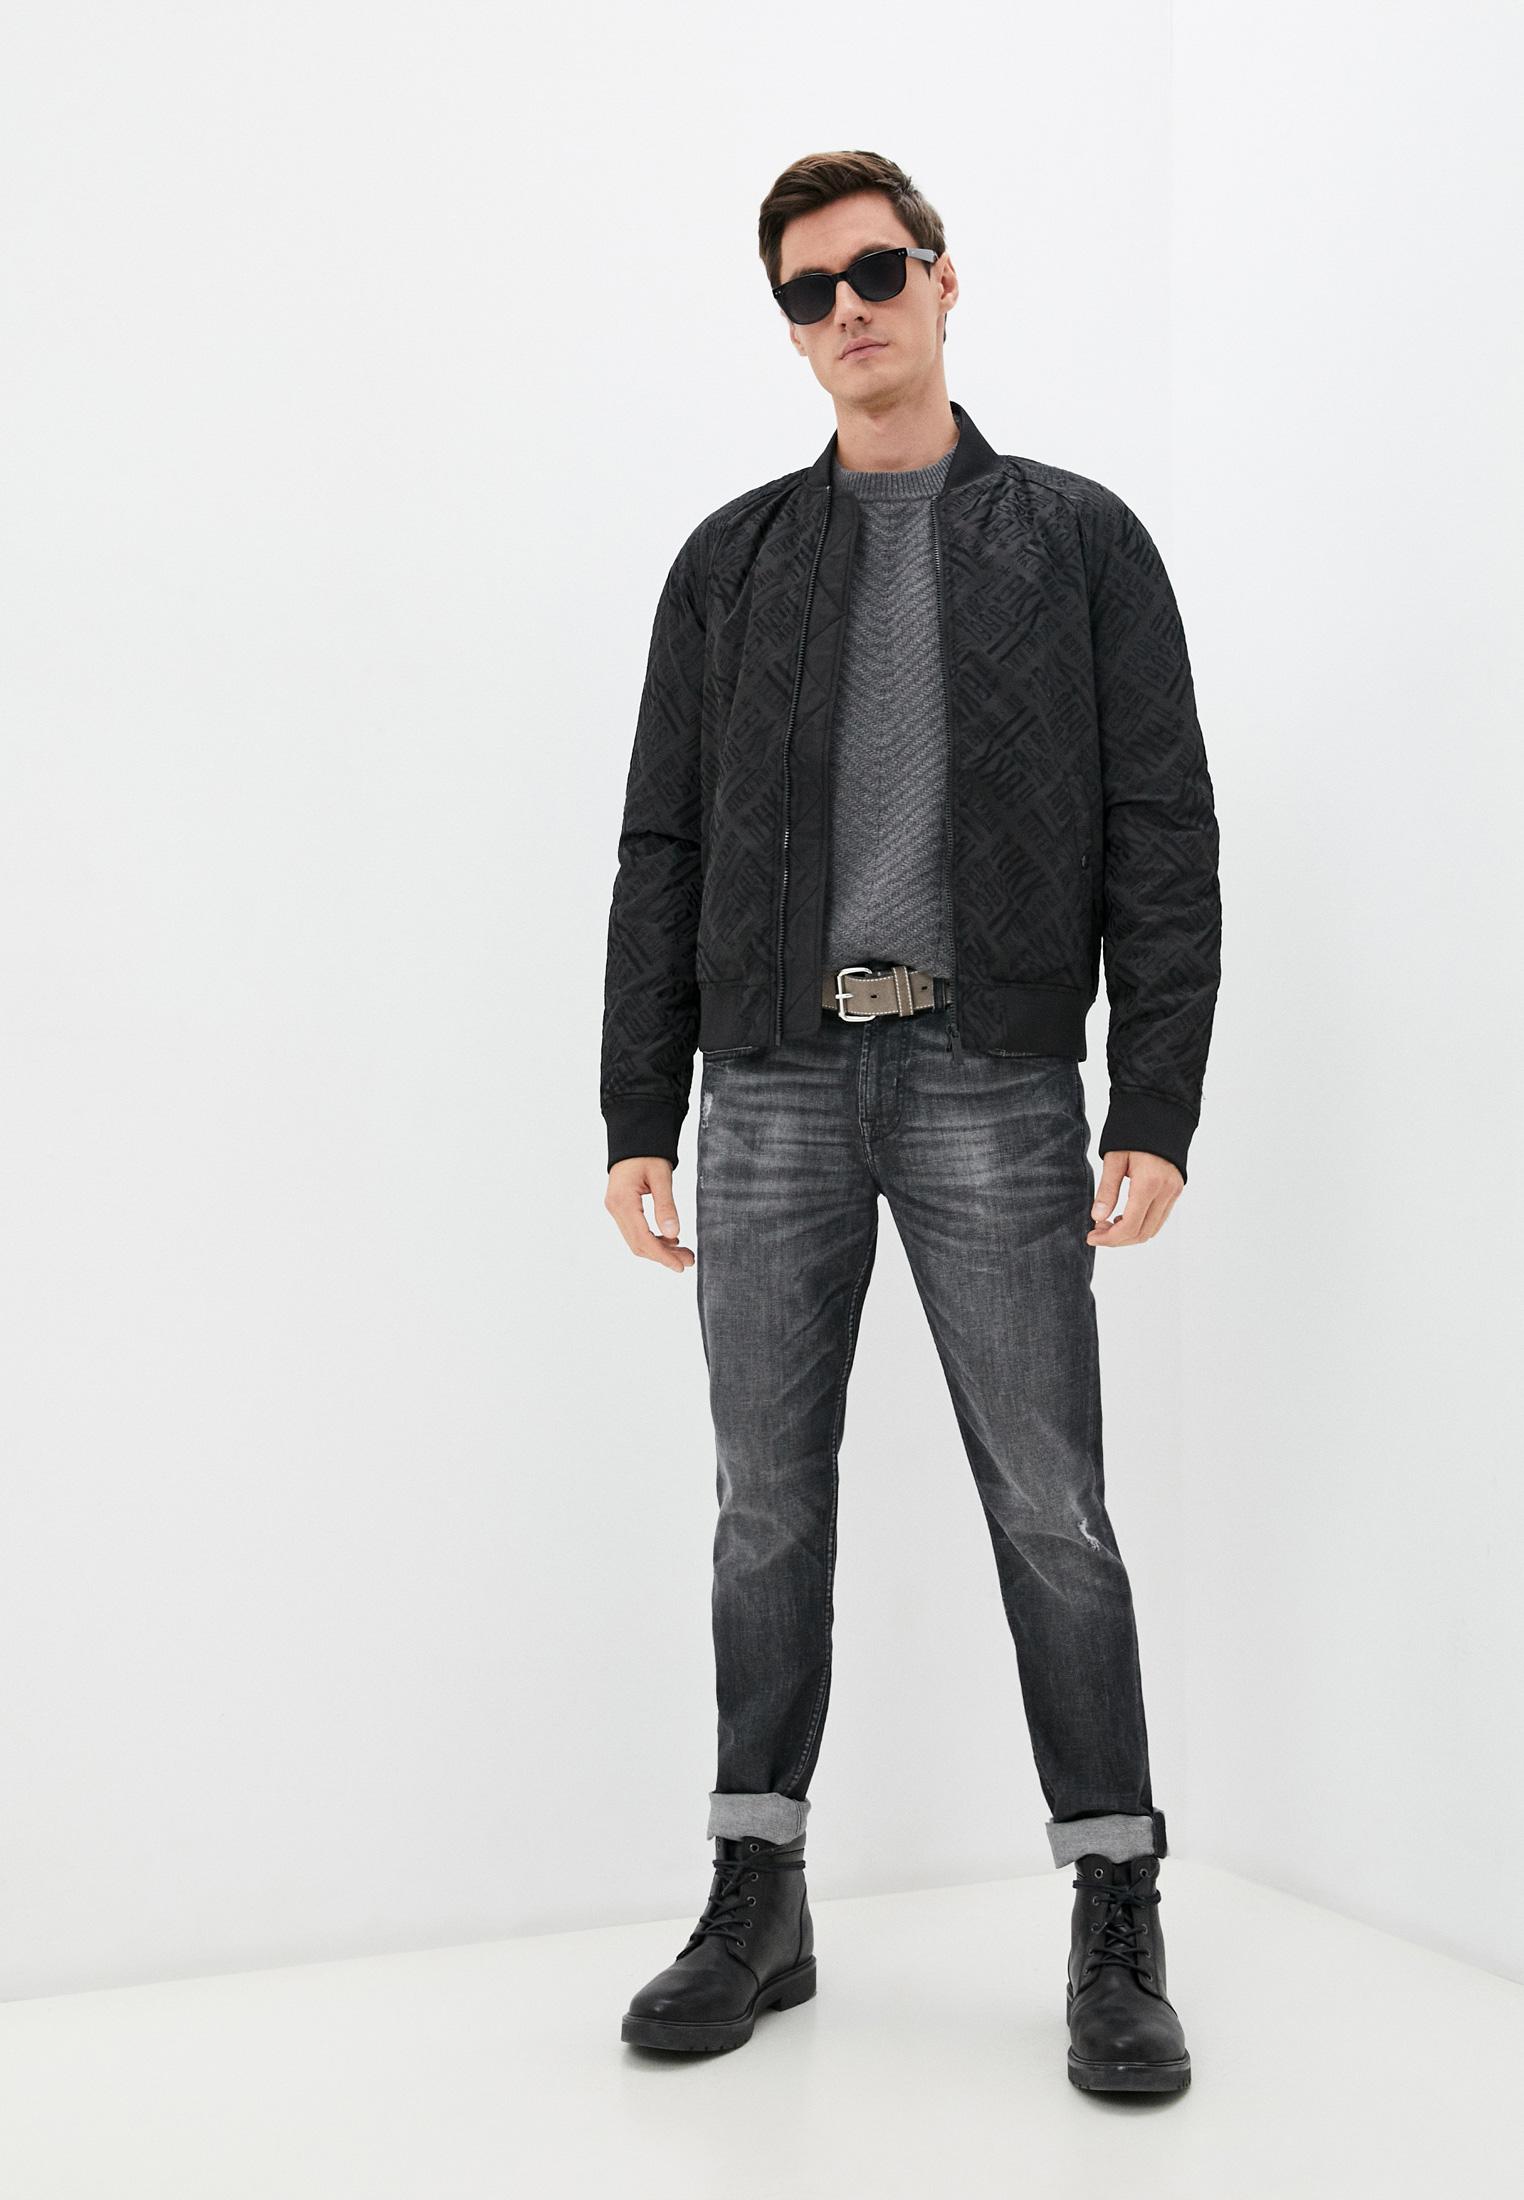 Зауженные джинсы 7 For All Mankind (7 Фо Олл Мэнкайнд) JSMXU790TH: изображение 3